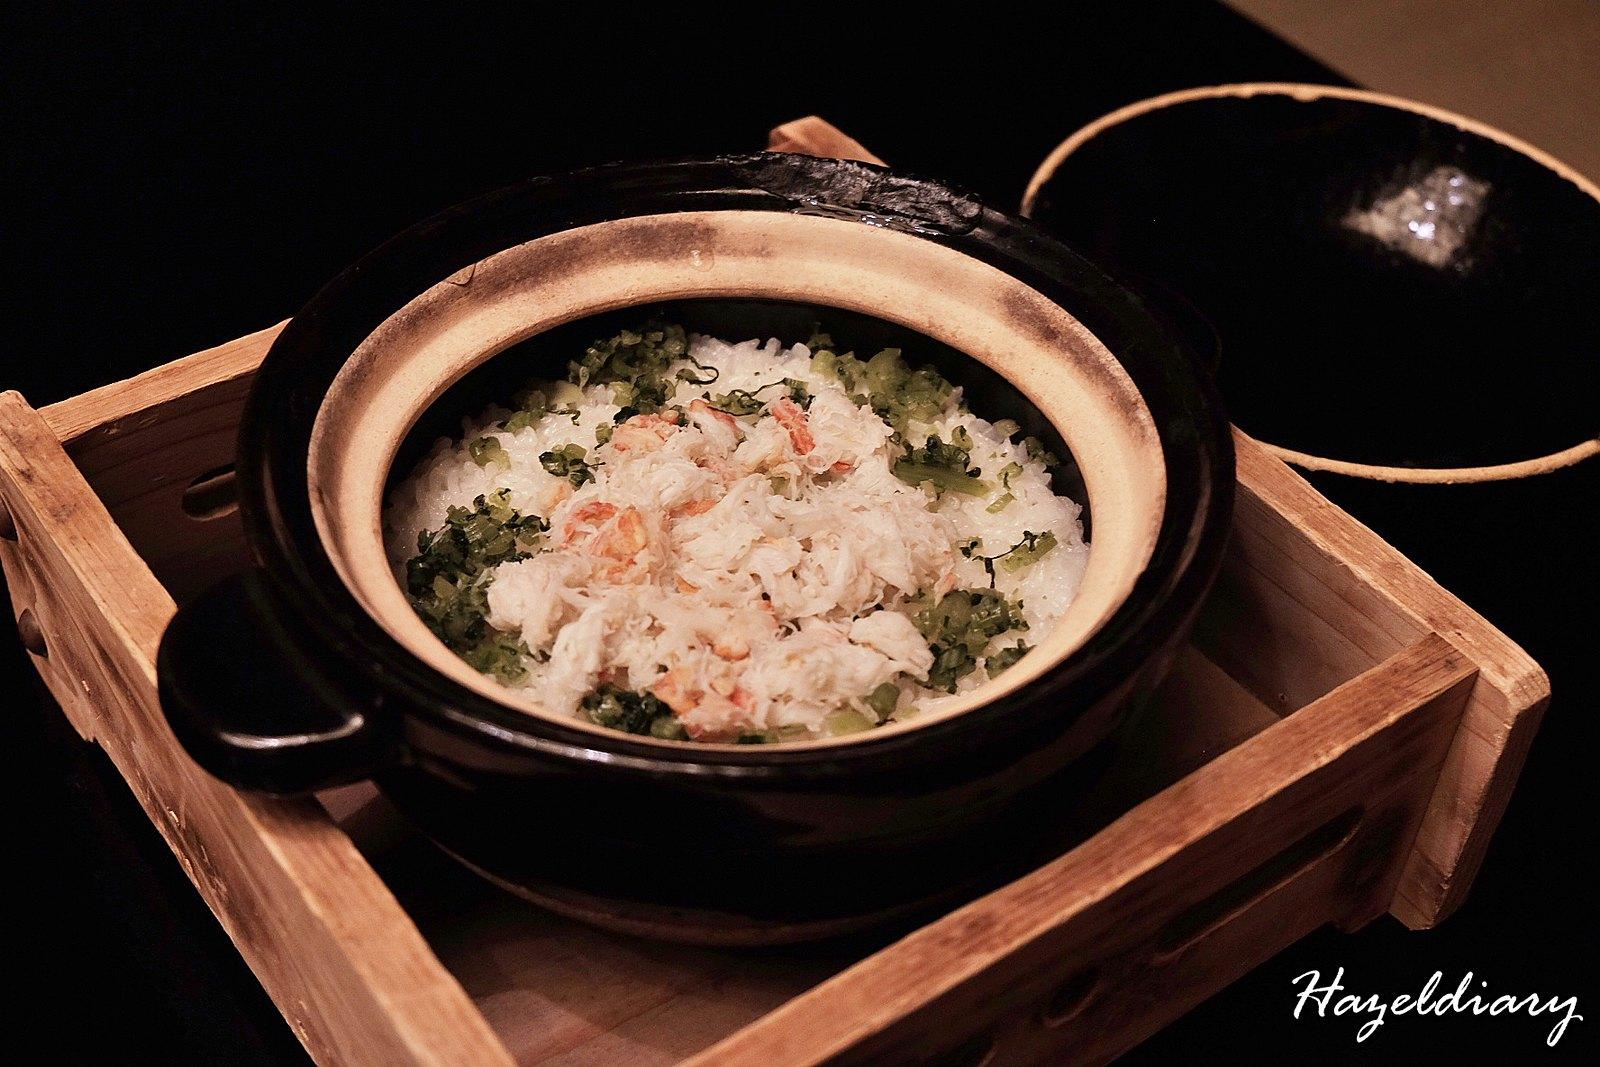 kaiseki soujuan keio plaza hotel tokyo-crab meat rice